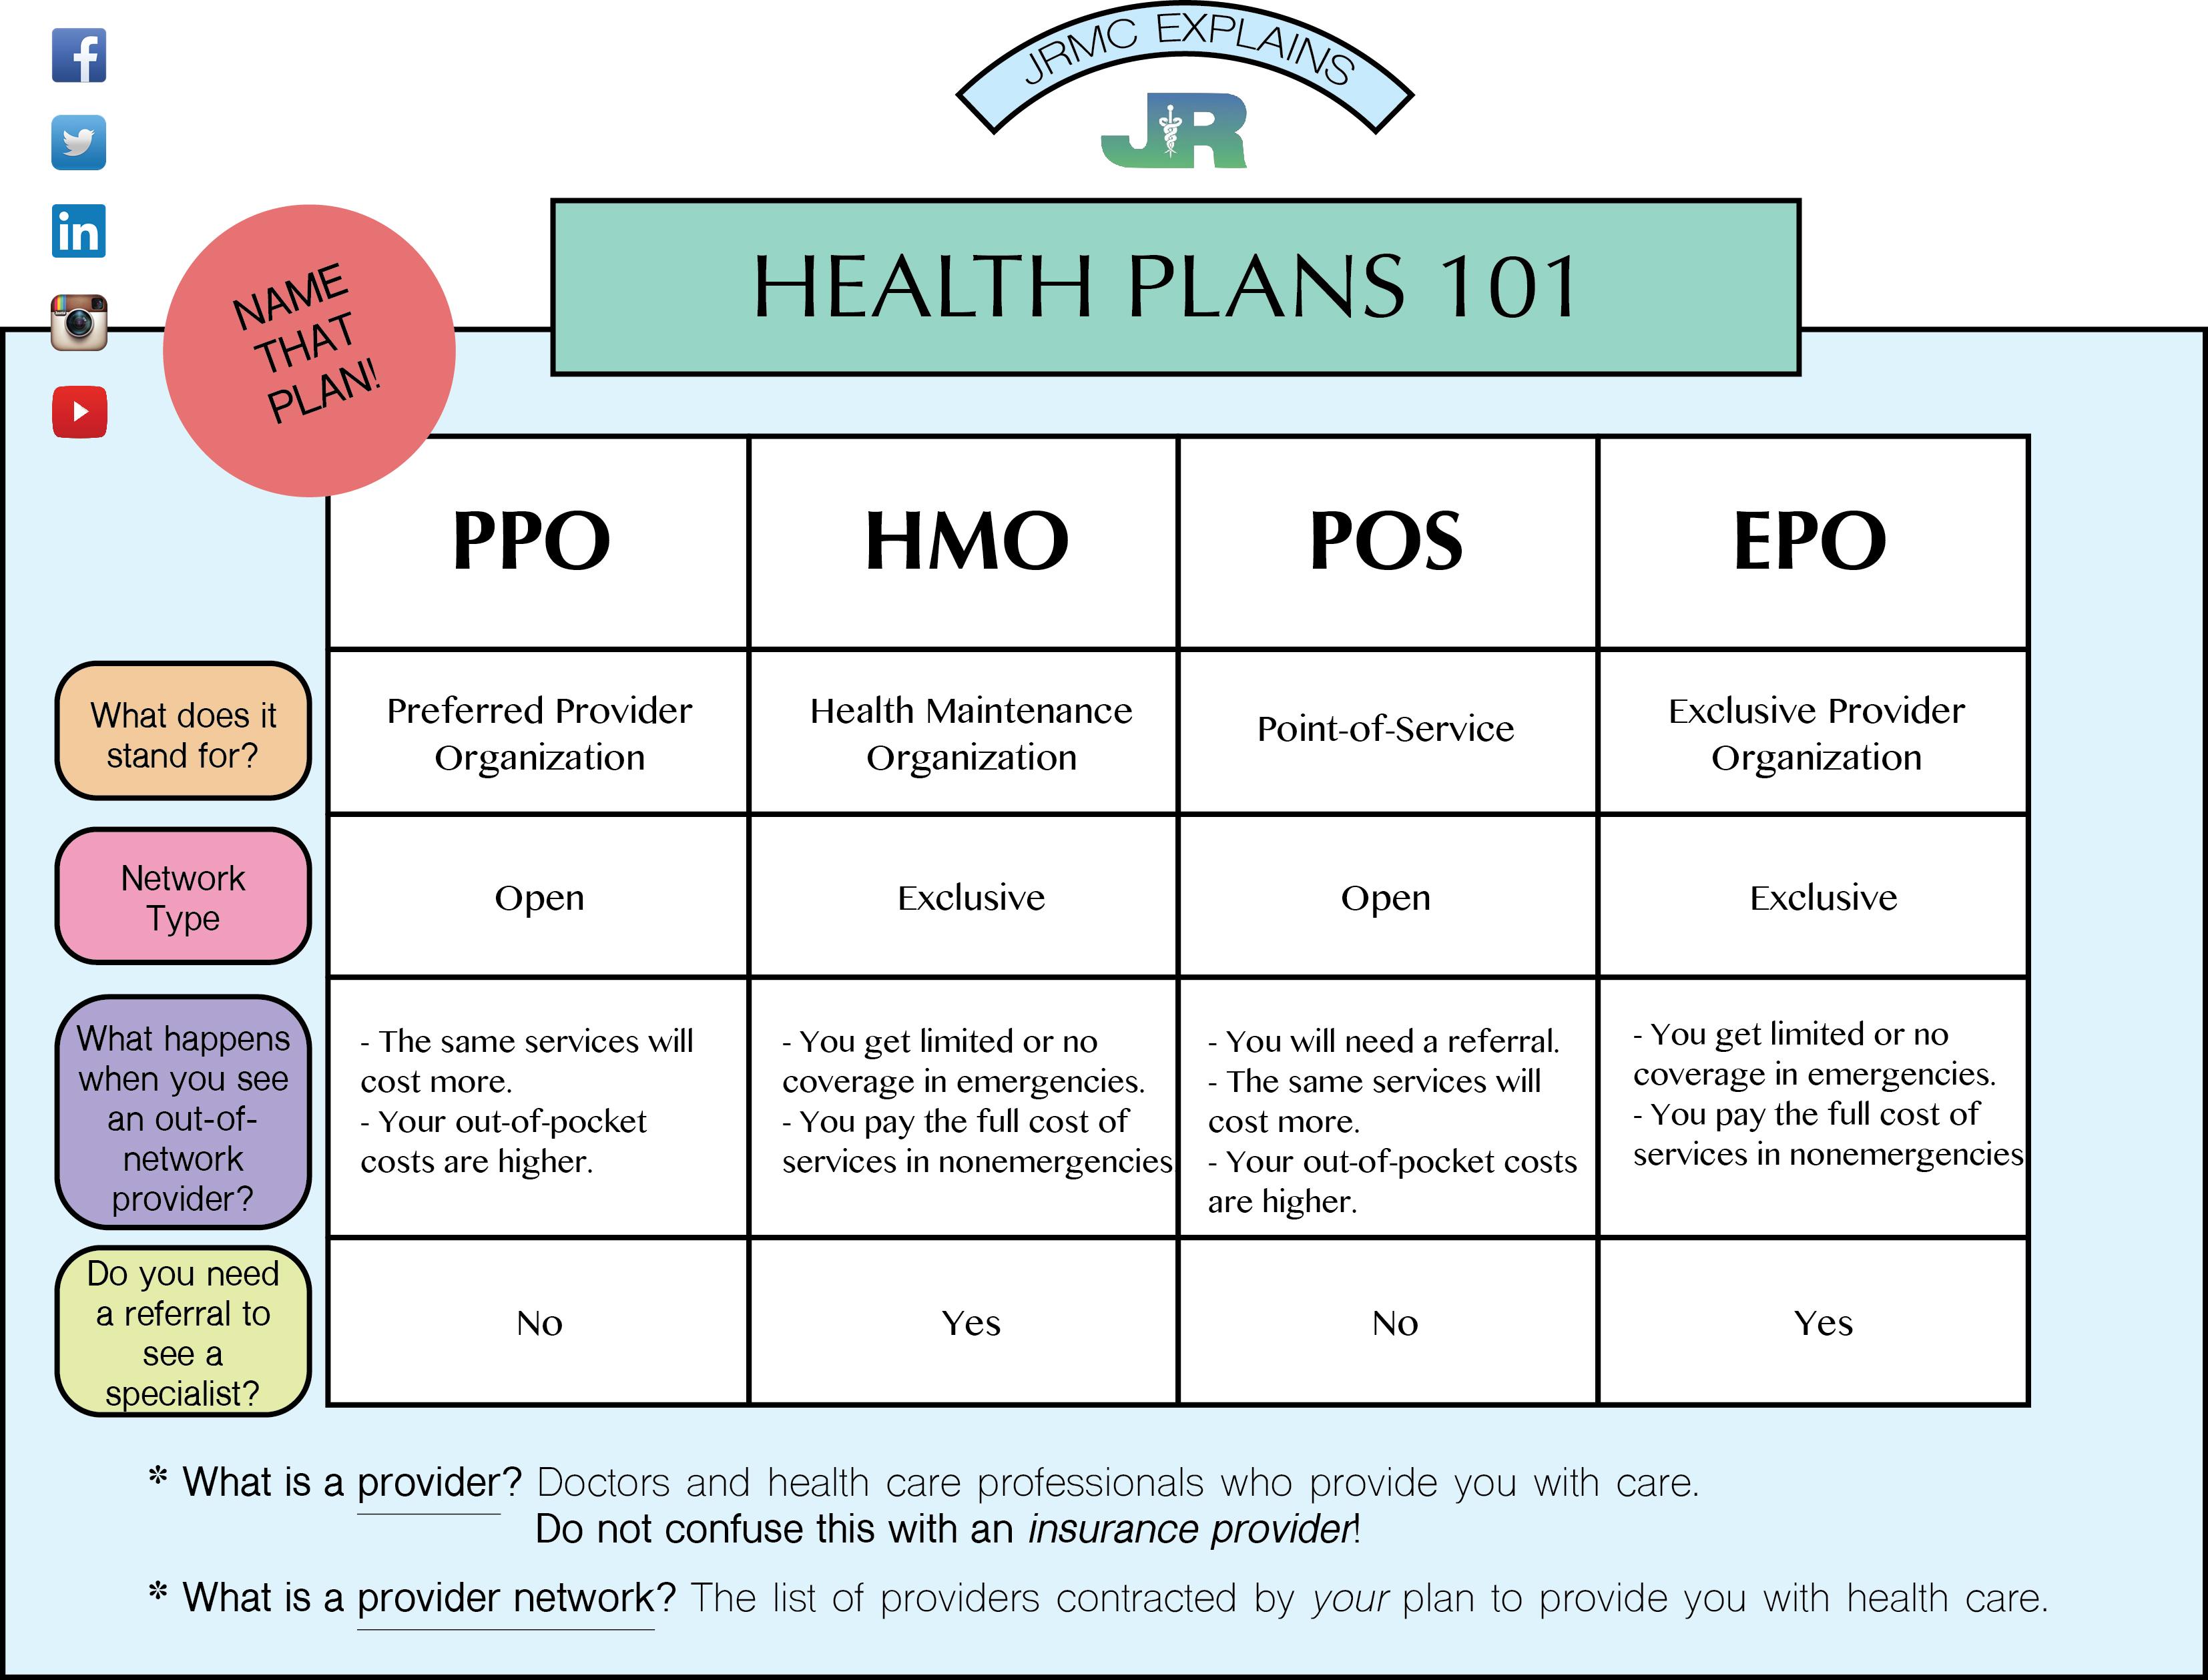 Health Plans 101 (English)